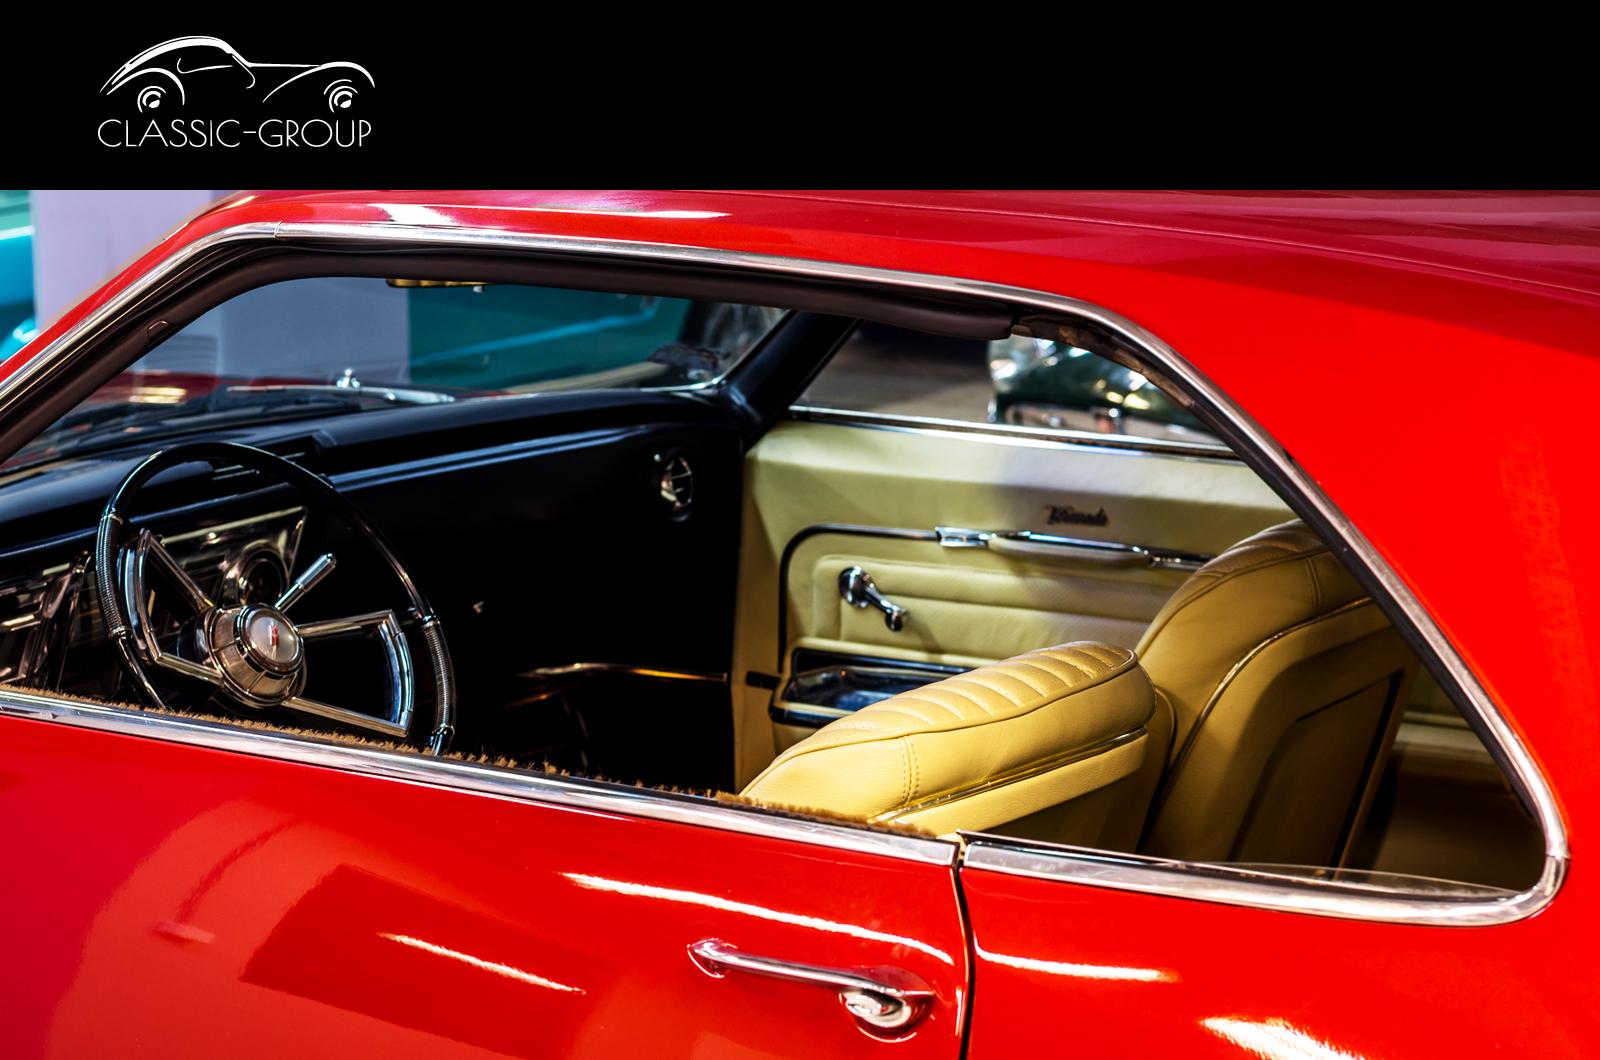 Oldsmobile Toronado (1965)-Classic Group